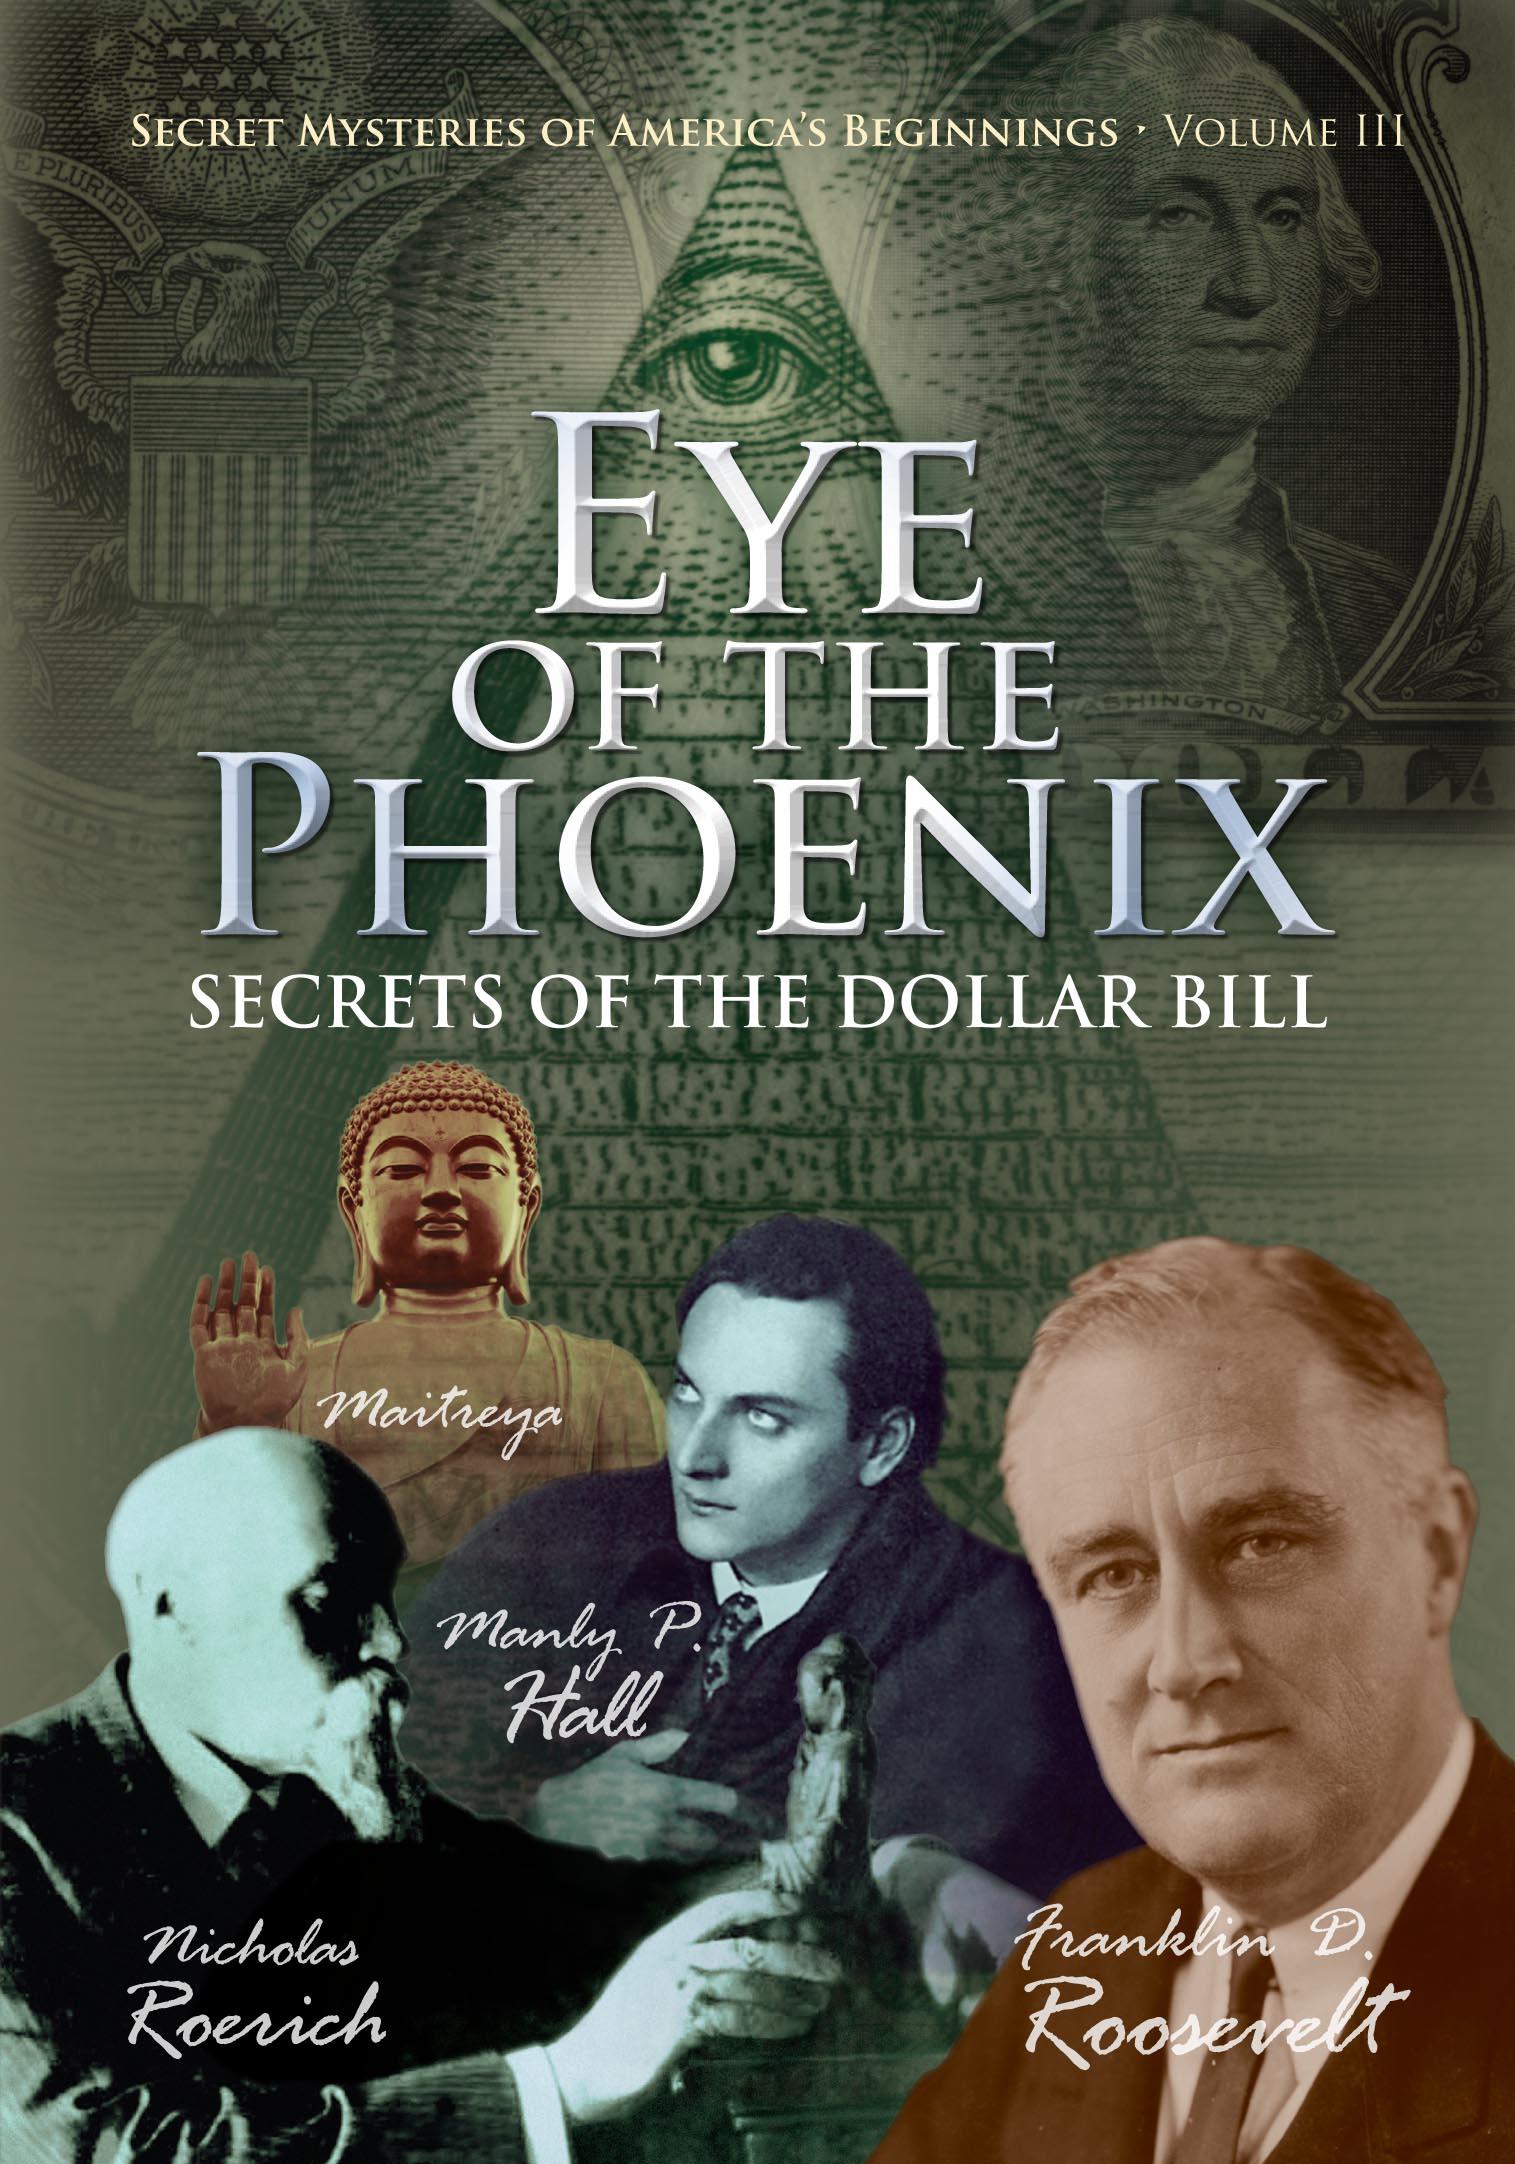 Eye of the Phoenix